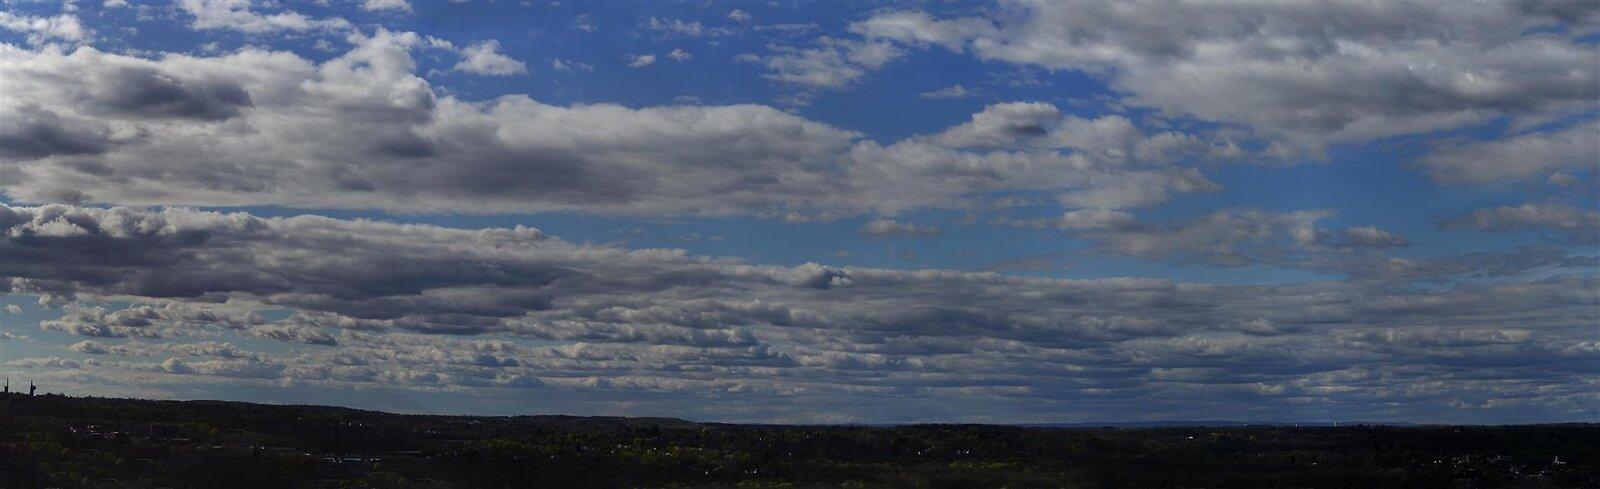 RX10 Oakwood cloud factory 019_stitch_DxO (Large).jpg